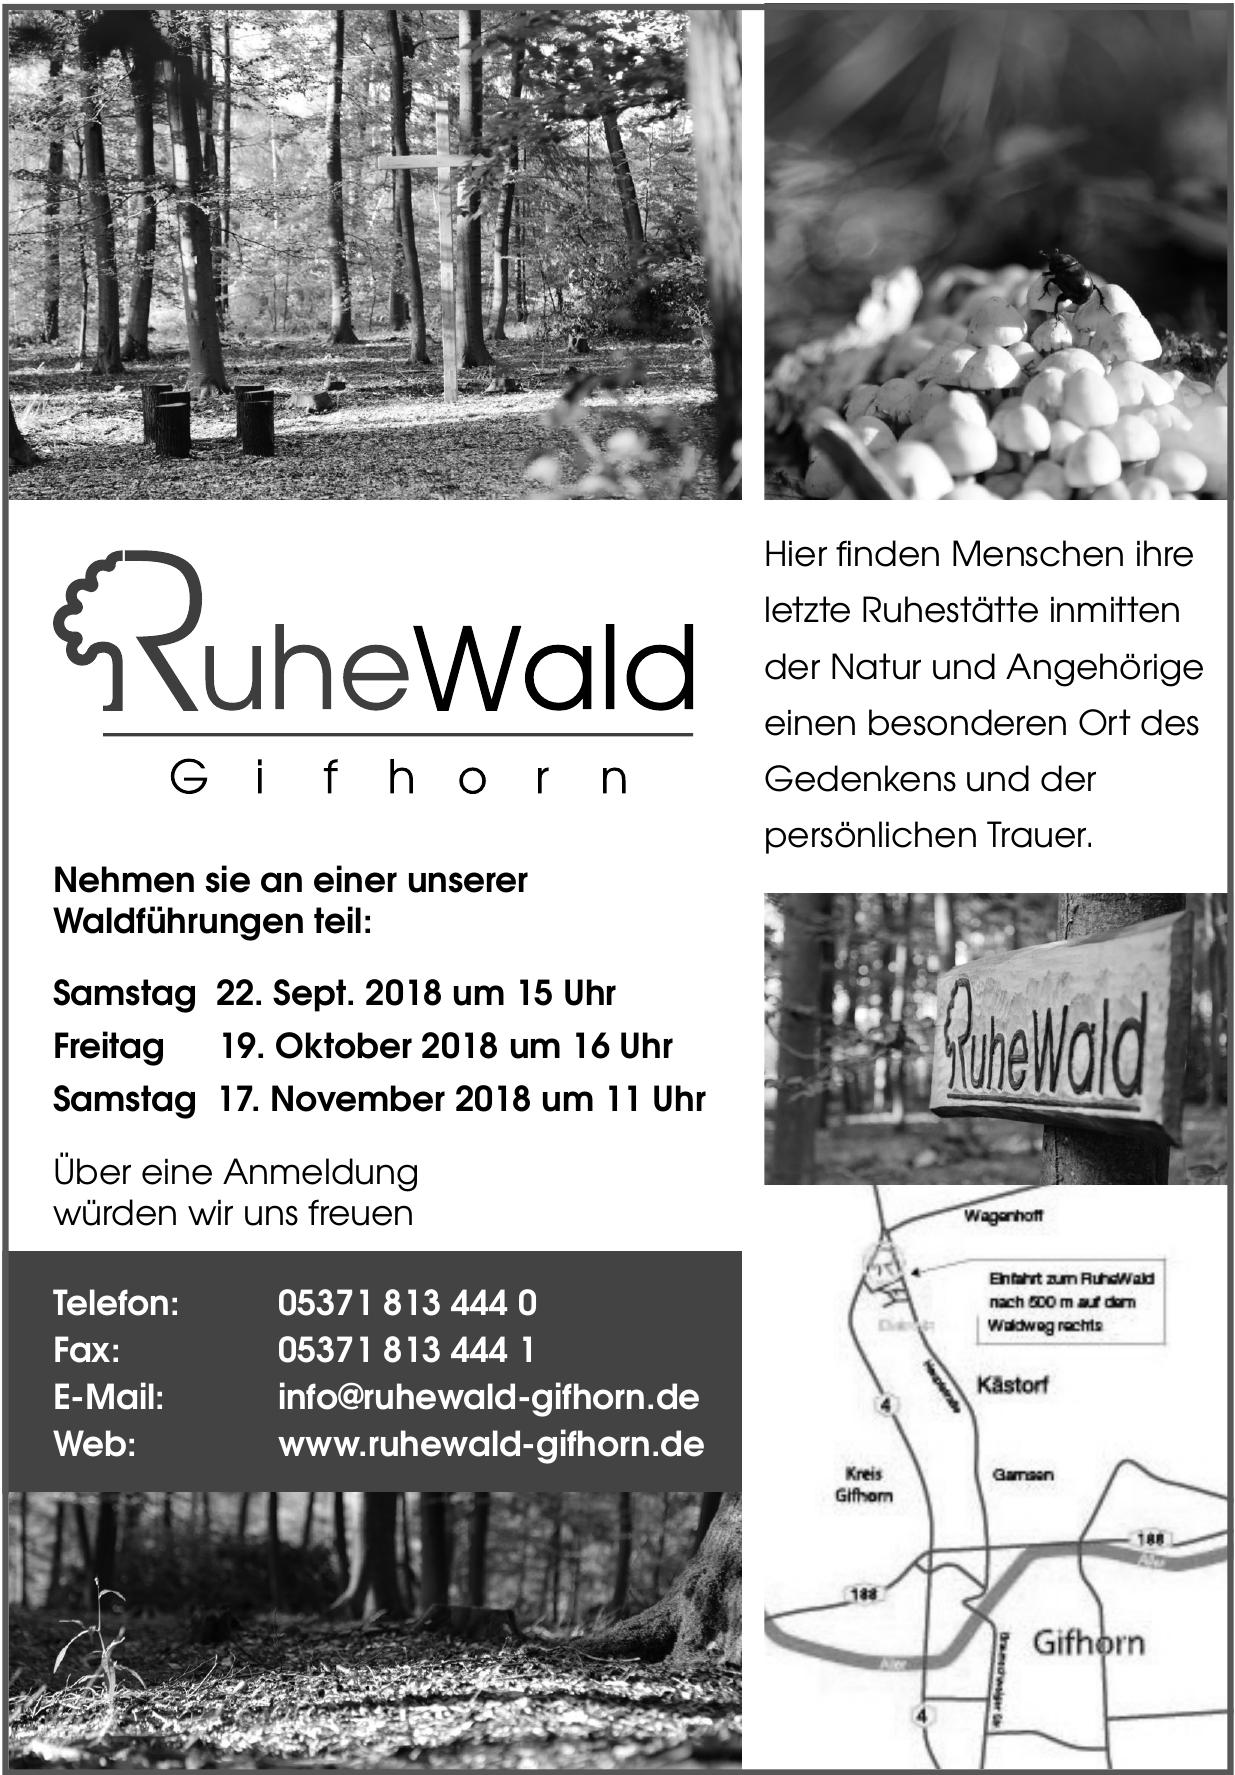 Ruhe Wald Gifhorn